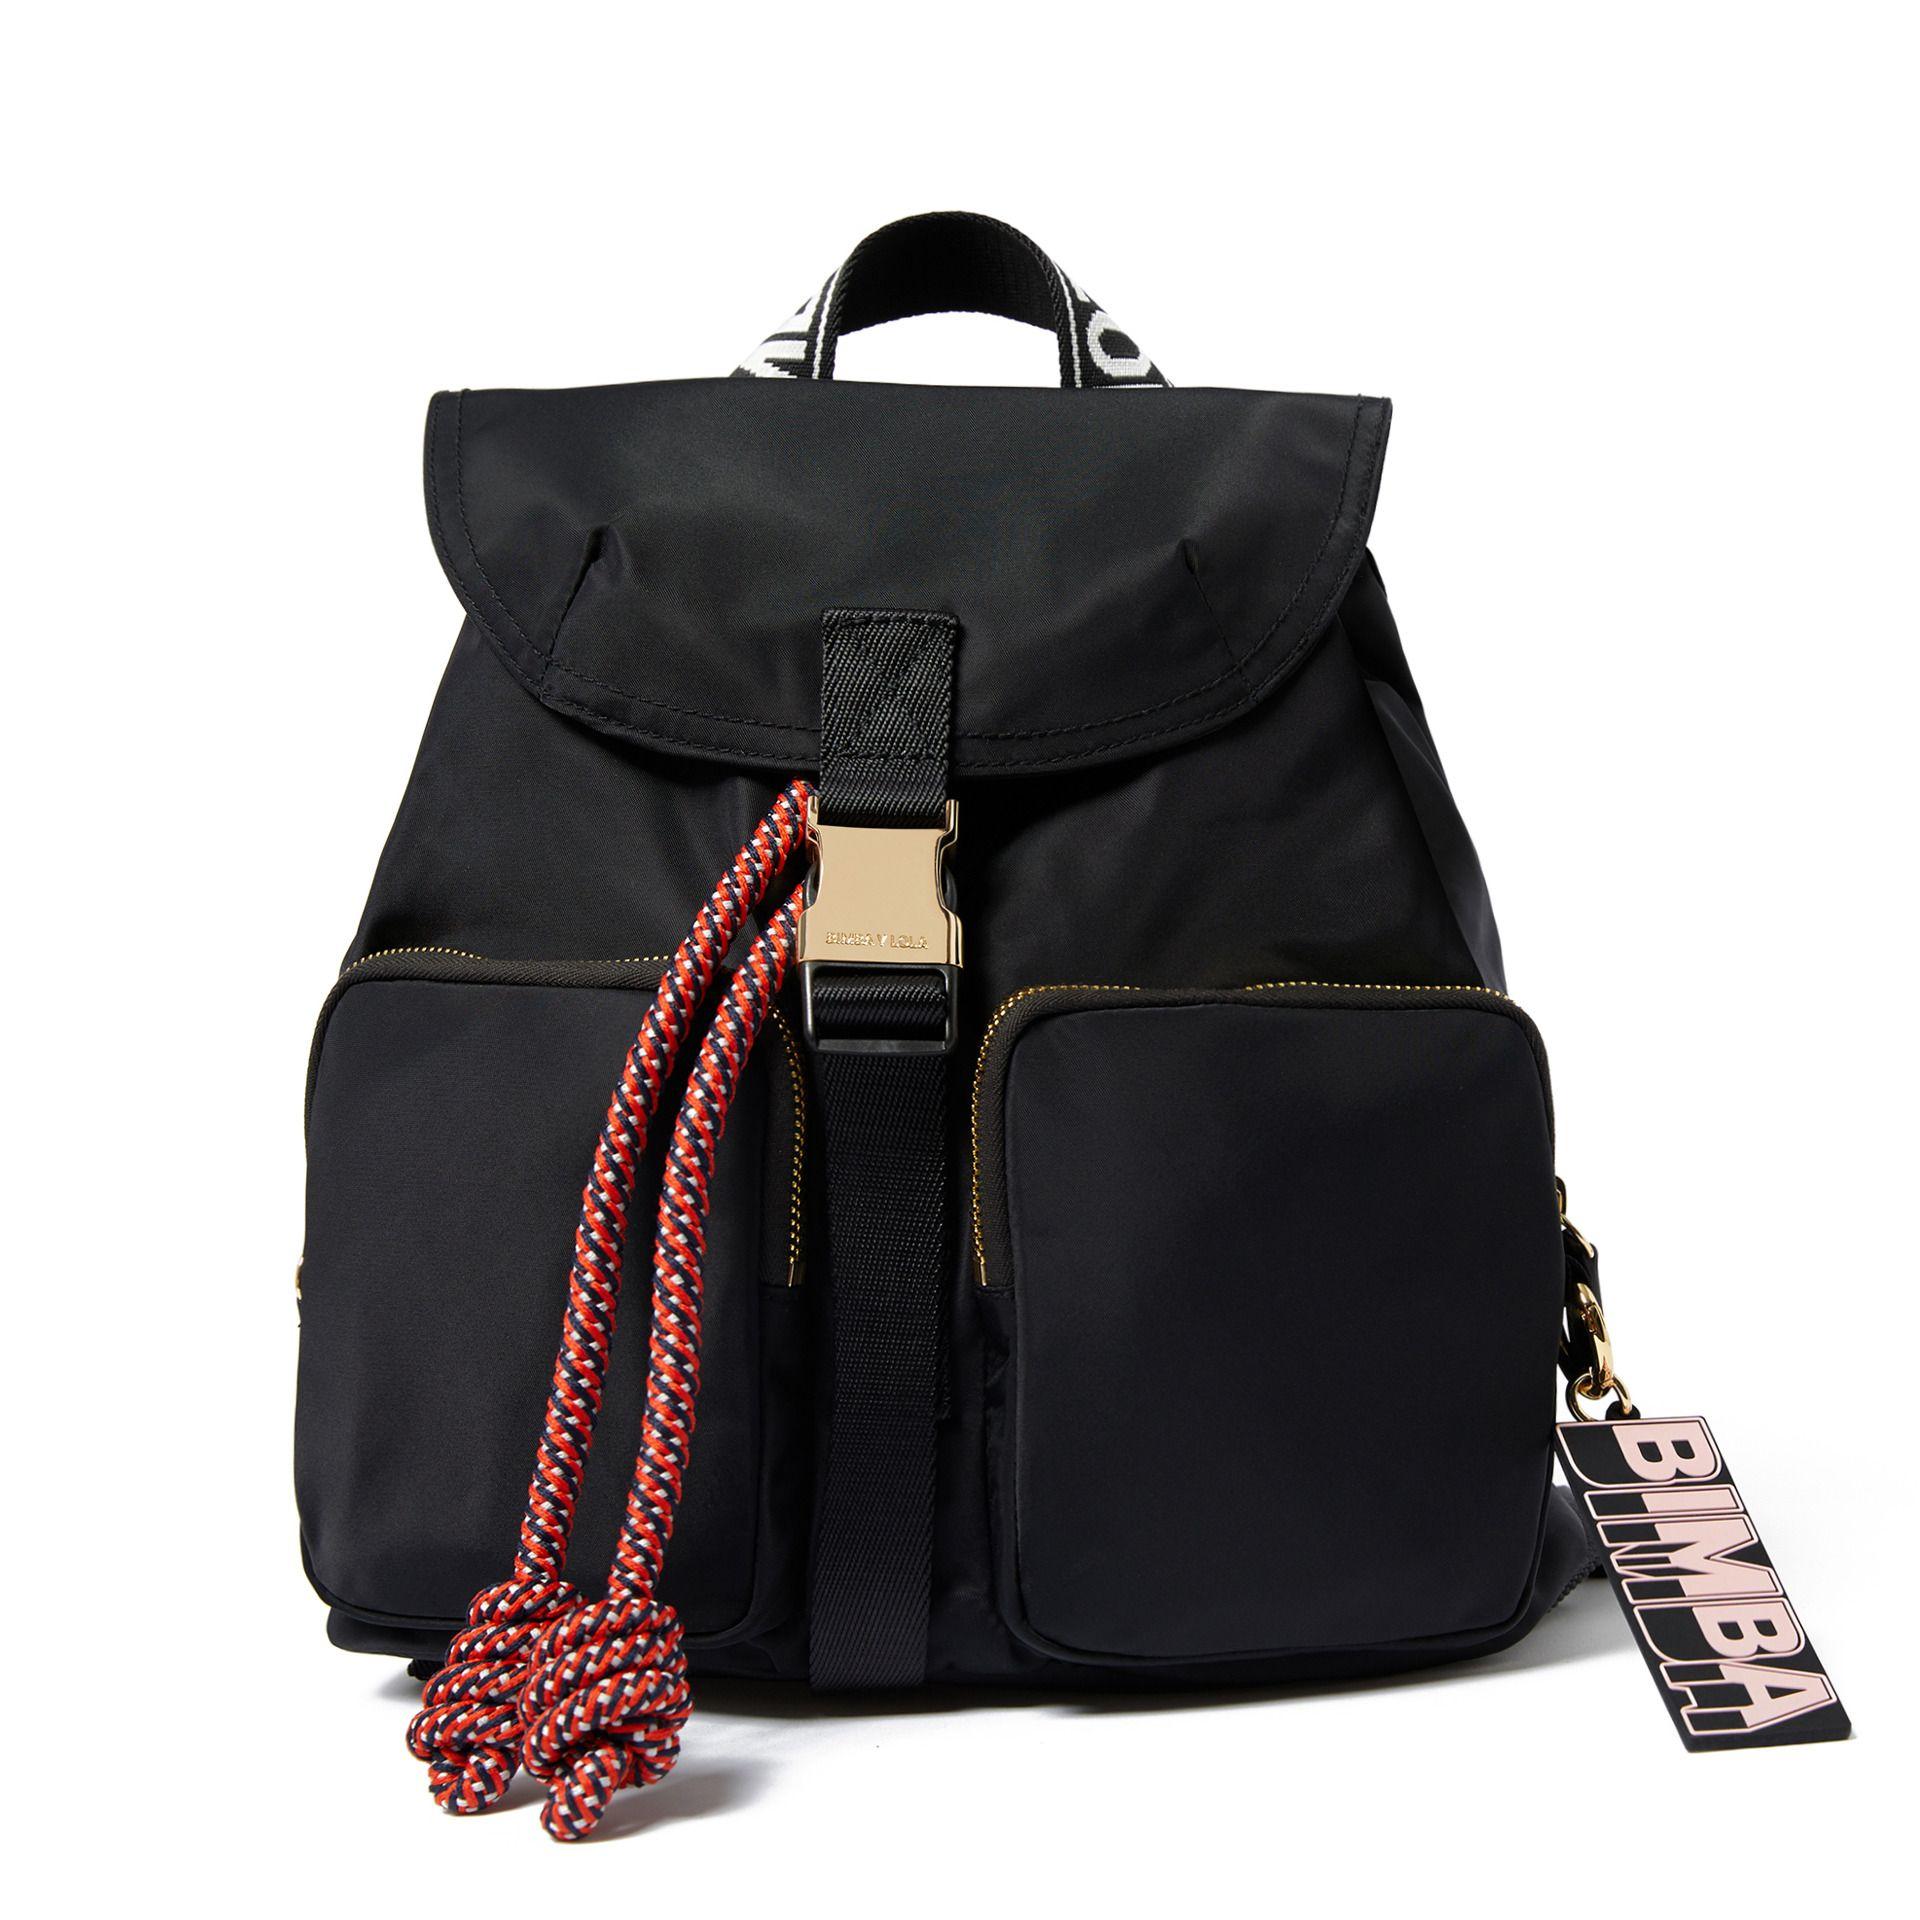 c86a46774 Mochila mediana negra | Complementos | Black backpack, Leather ...